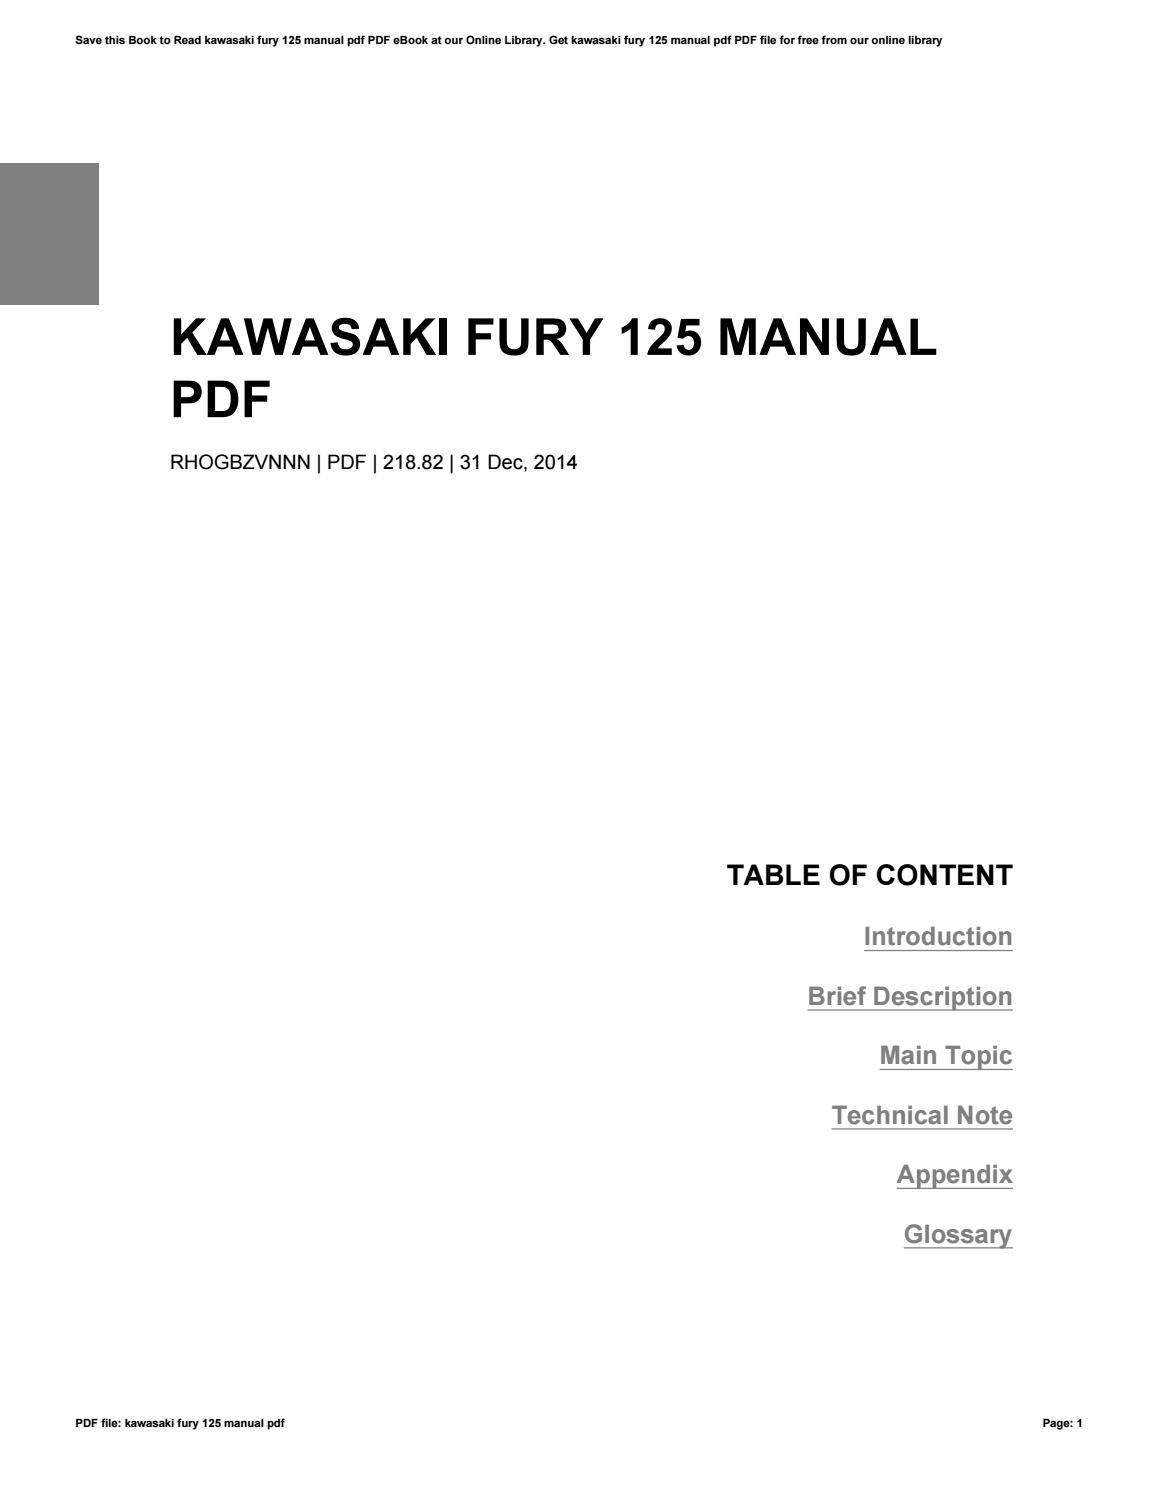 Kawasaki Fury 125 Manual Pdf By Domingofiore4721